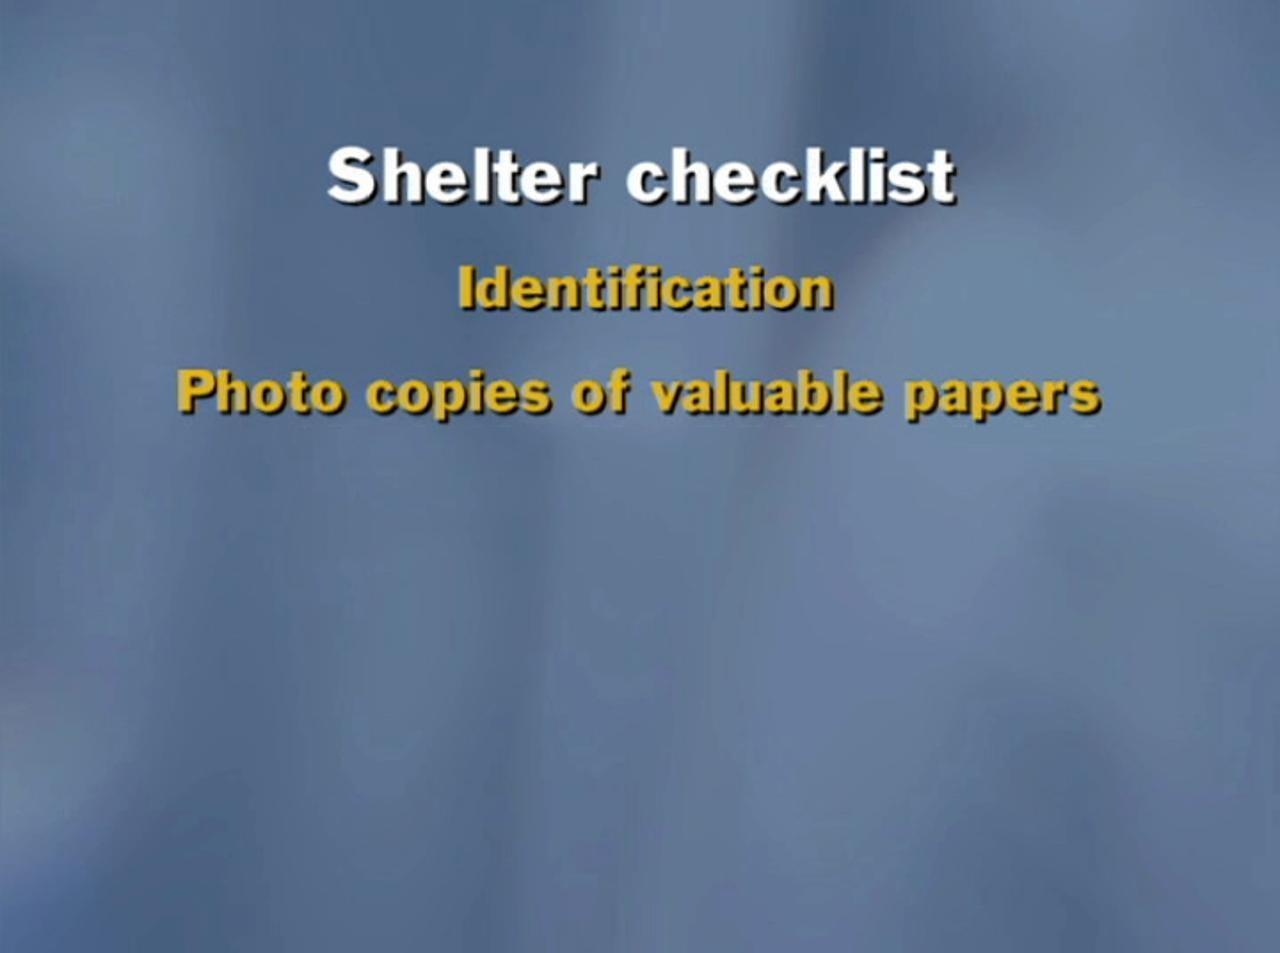 Hurricane prep: Shelter checklist